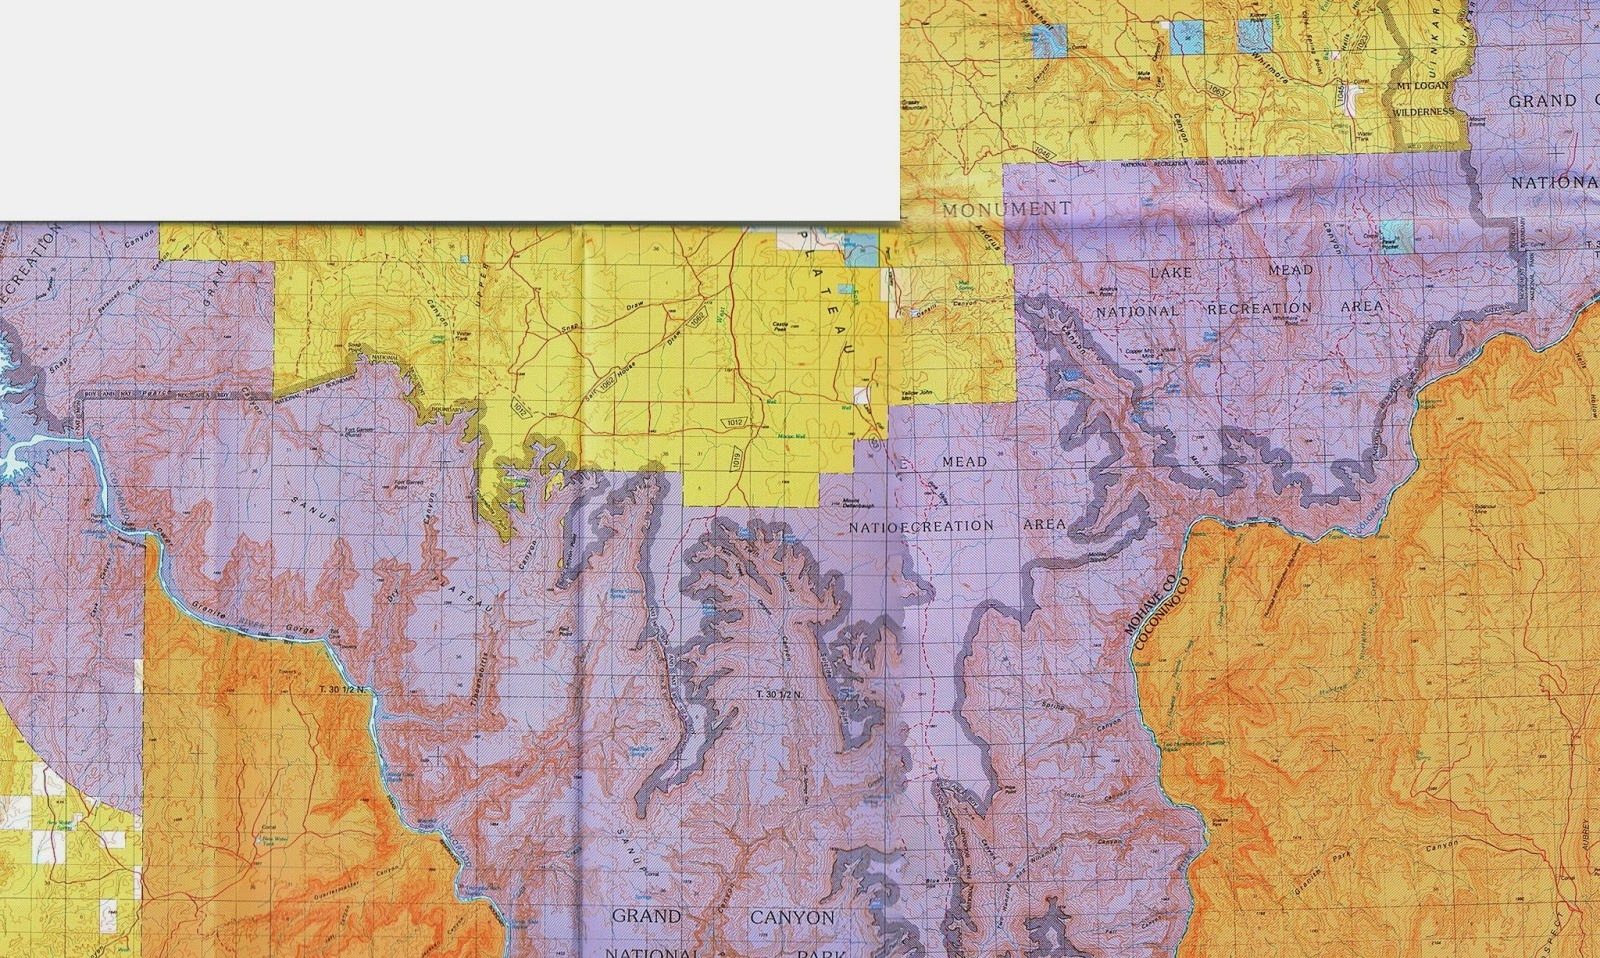 Map Of Arizona Strip.Celebrating The Grand Canyon Study 3 The Adjacent Lands Study